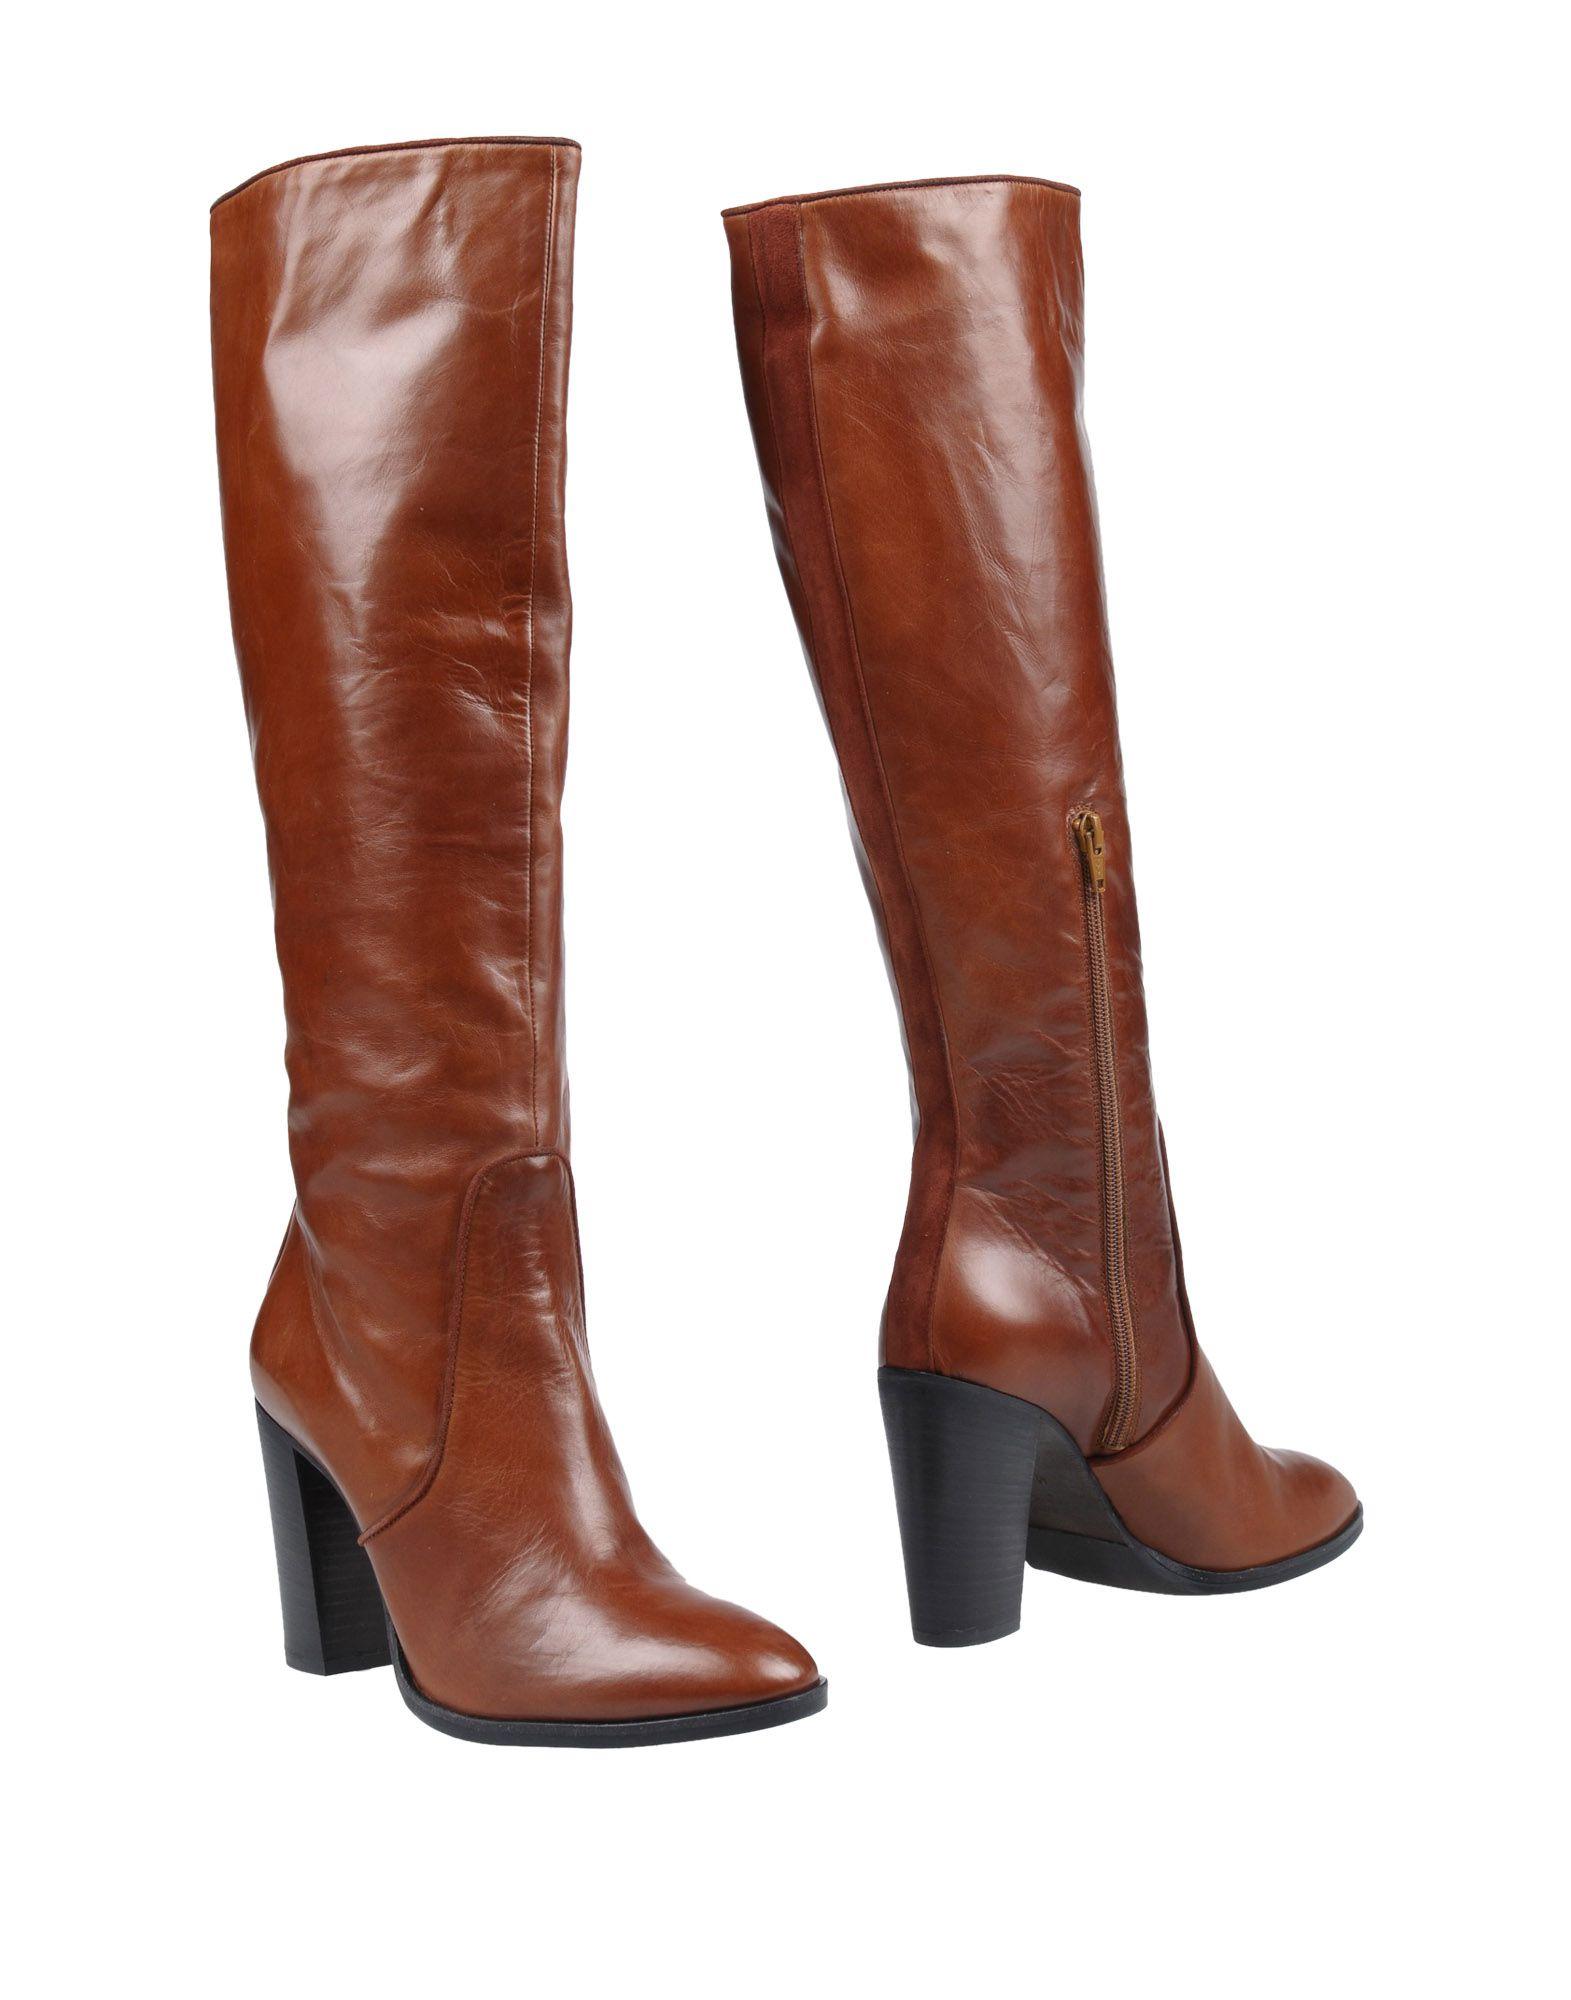 Garrice Stiefel Damen  11421491WB 11421491WB 11421491WB Gute Qualität beliebte Schuhe 6d74b8